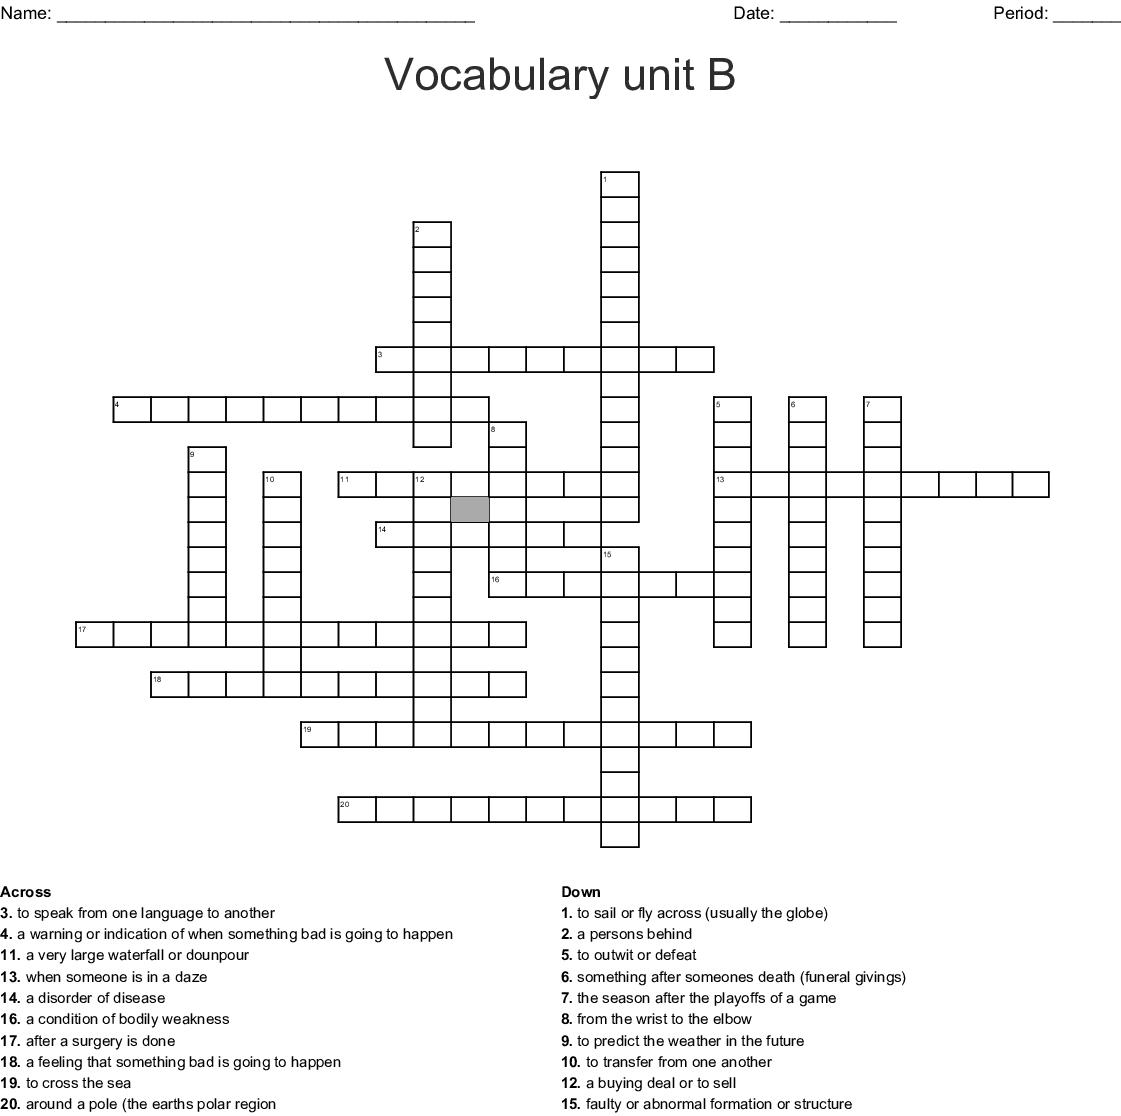 Similar To Daija S Prefix Vocabulary Crossword Puzzle